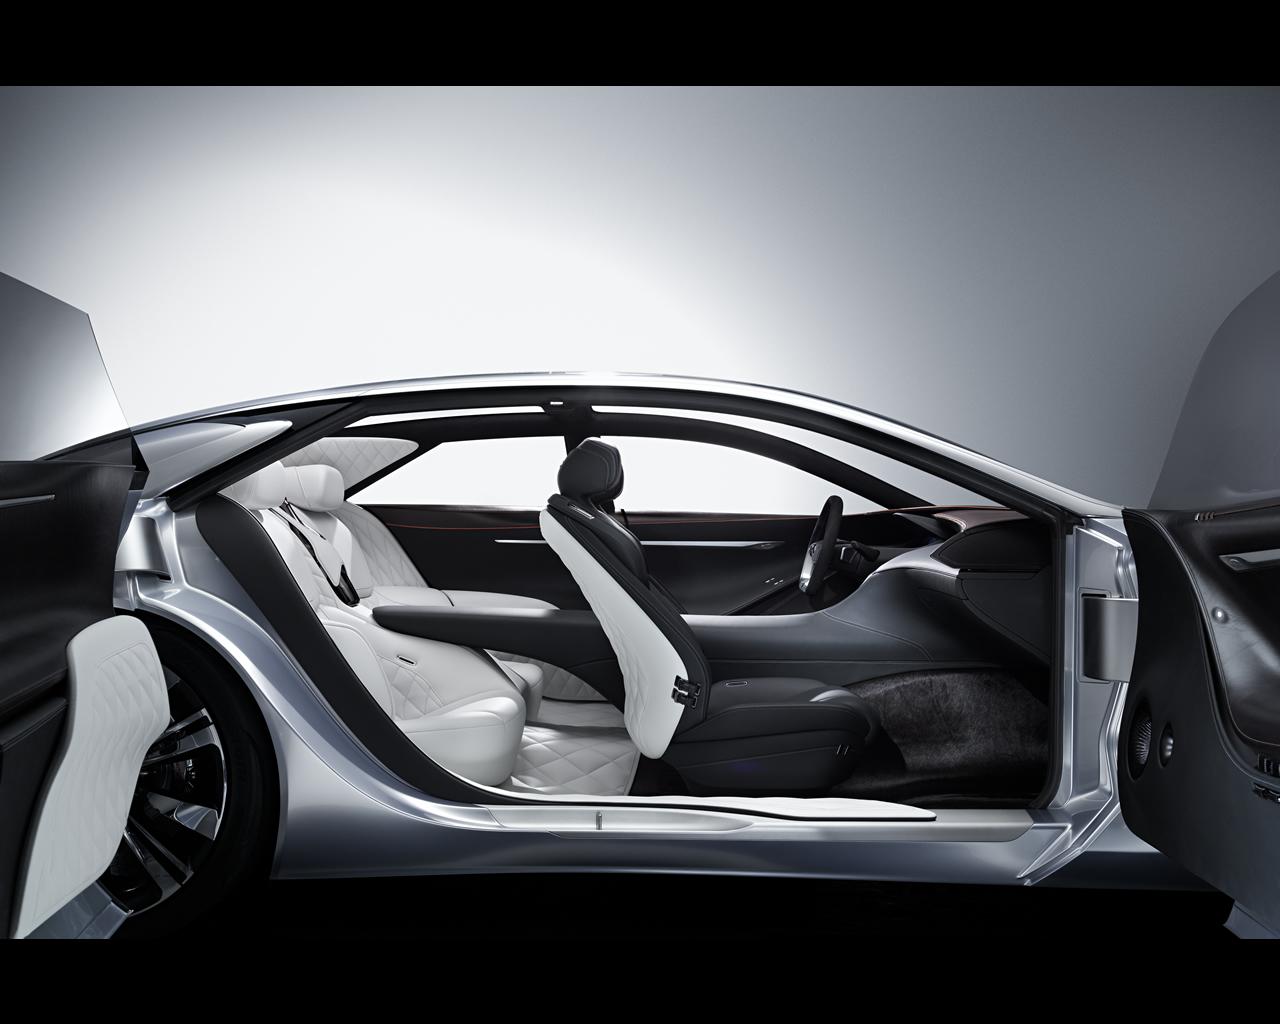 2014 Infiniti Concept Car